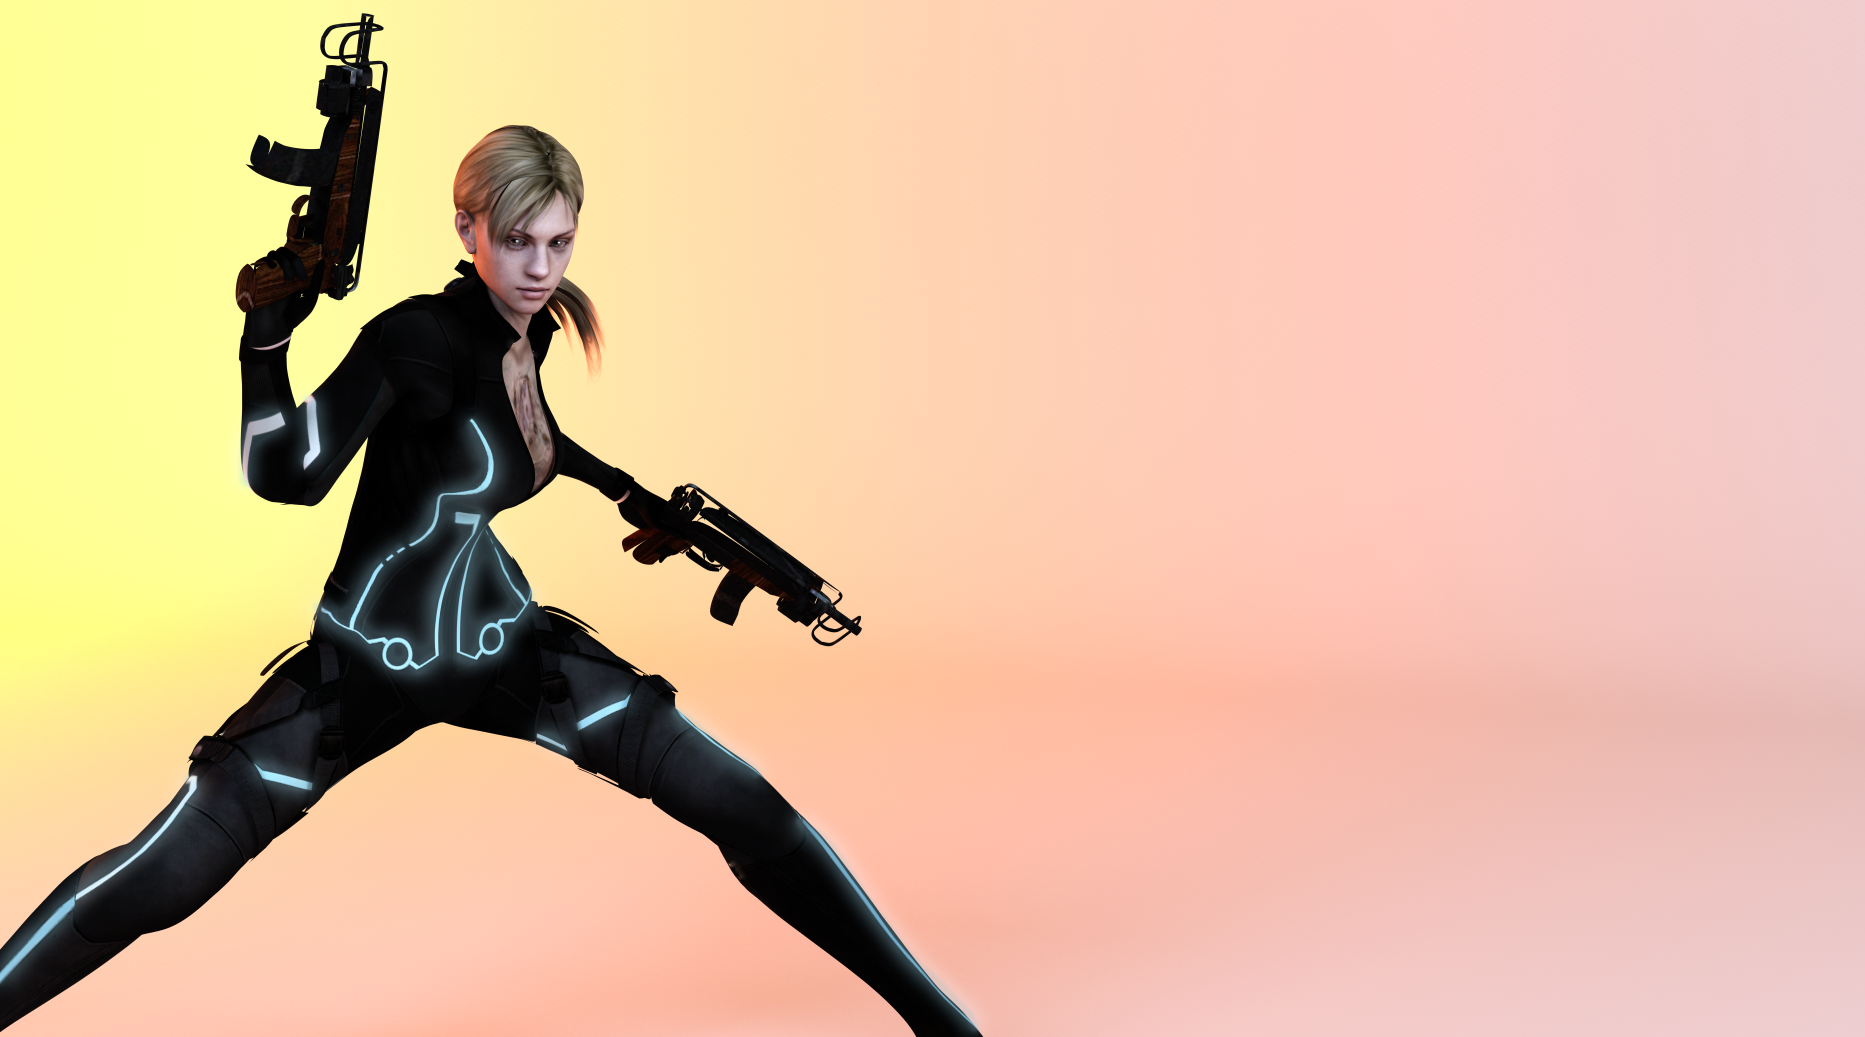 Resident Evil 5 Jill Valentine Collaboration By Ishikahiruma